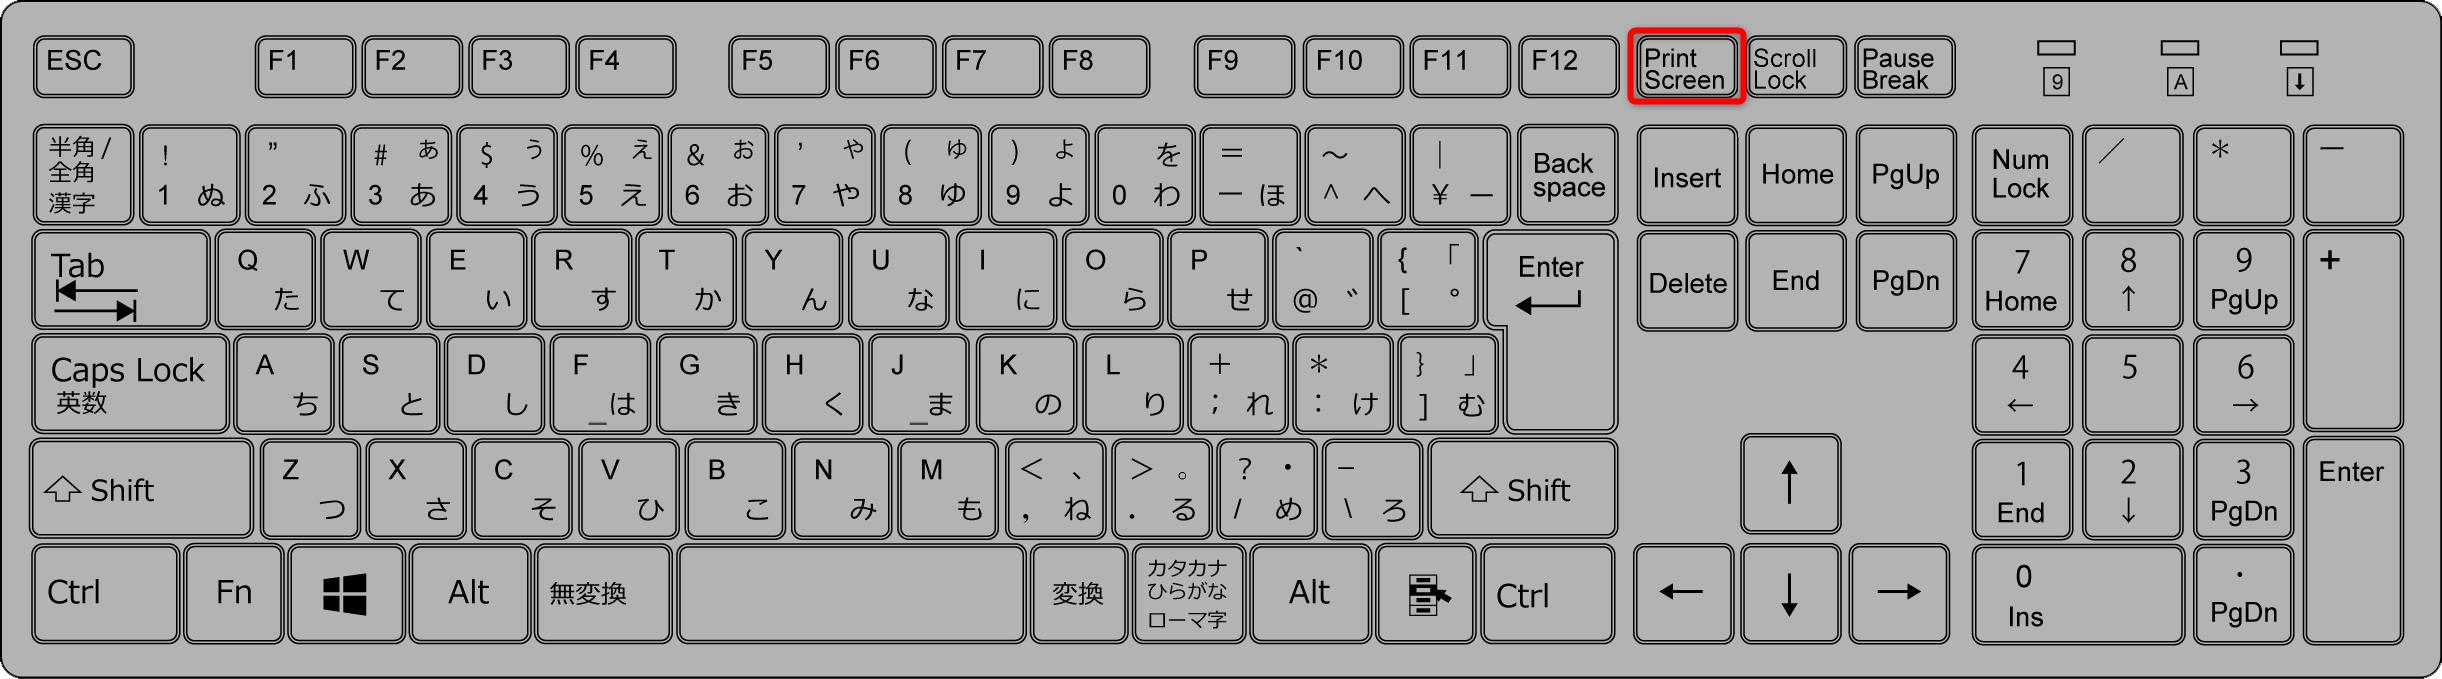 ExcelにPDFを画像化して貼り付ける(挿入する)3つの方法と、画像がぼやけないようにするコツ